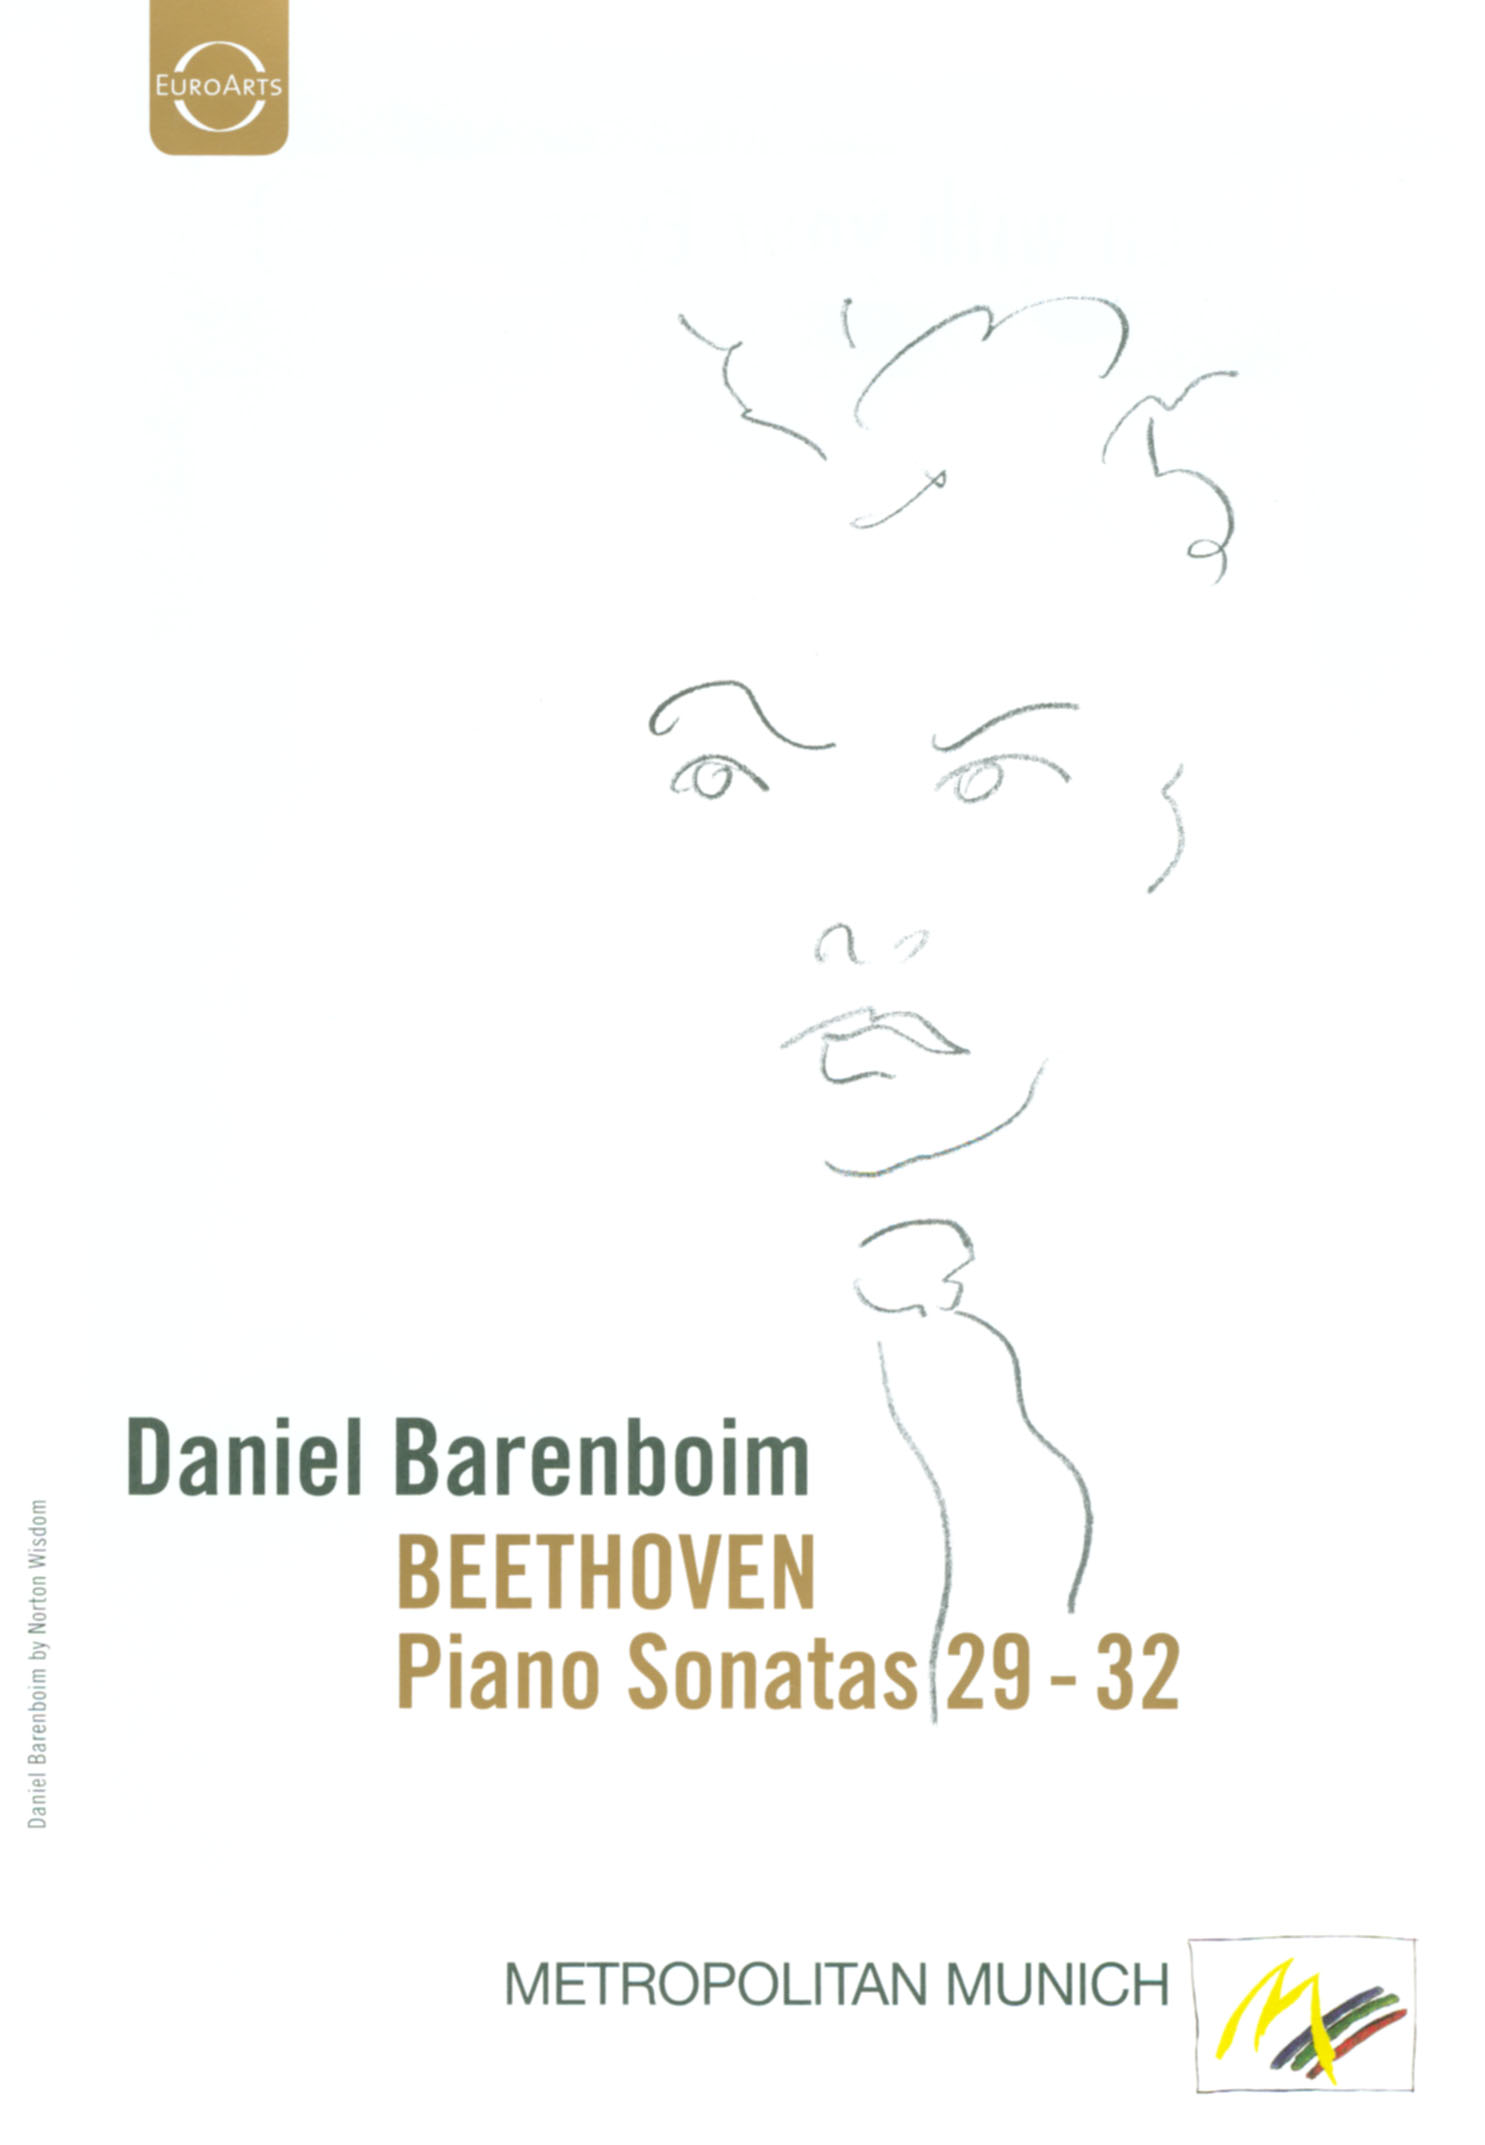 Daniel Barenboim: Beethoven - Piano Sonatas 29-32